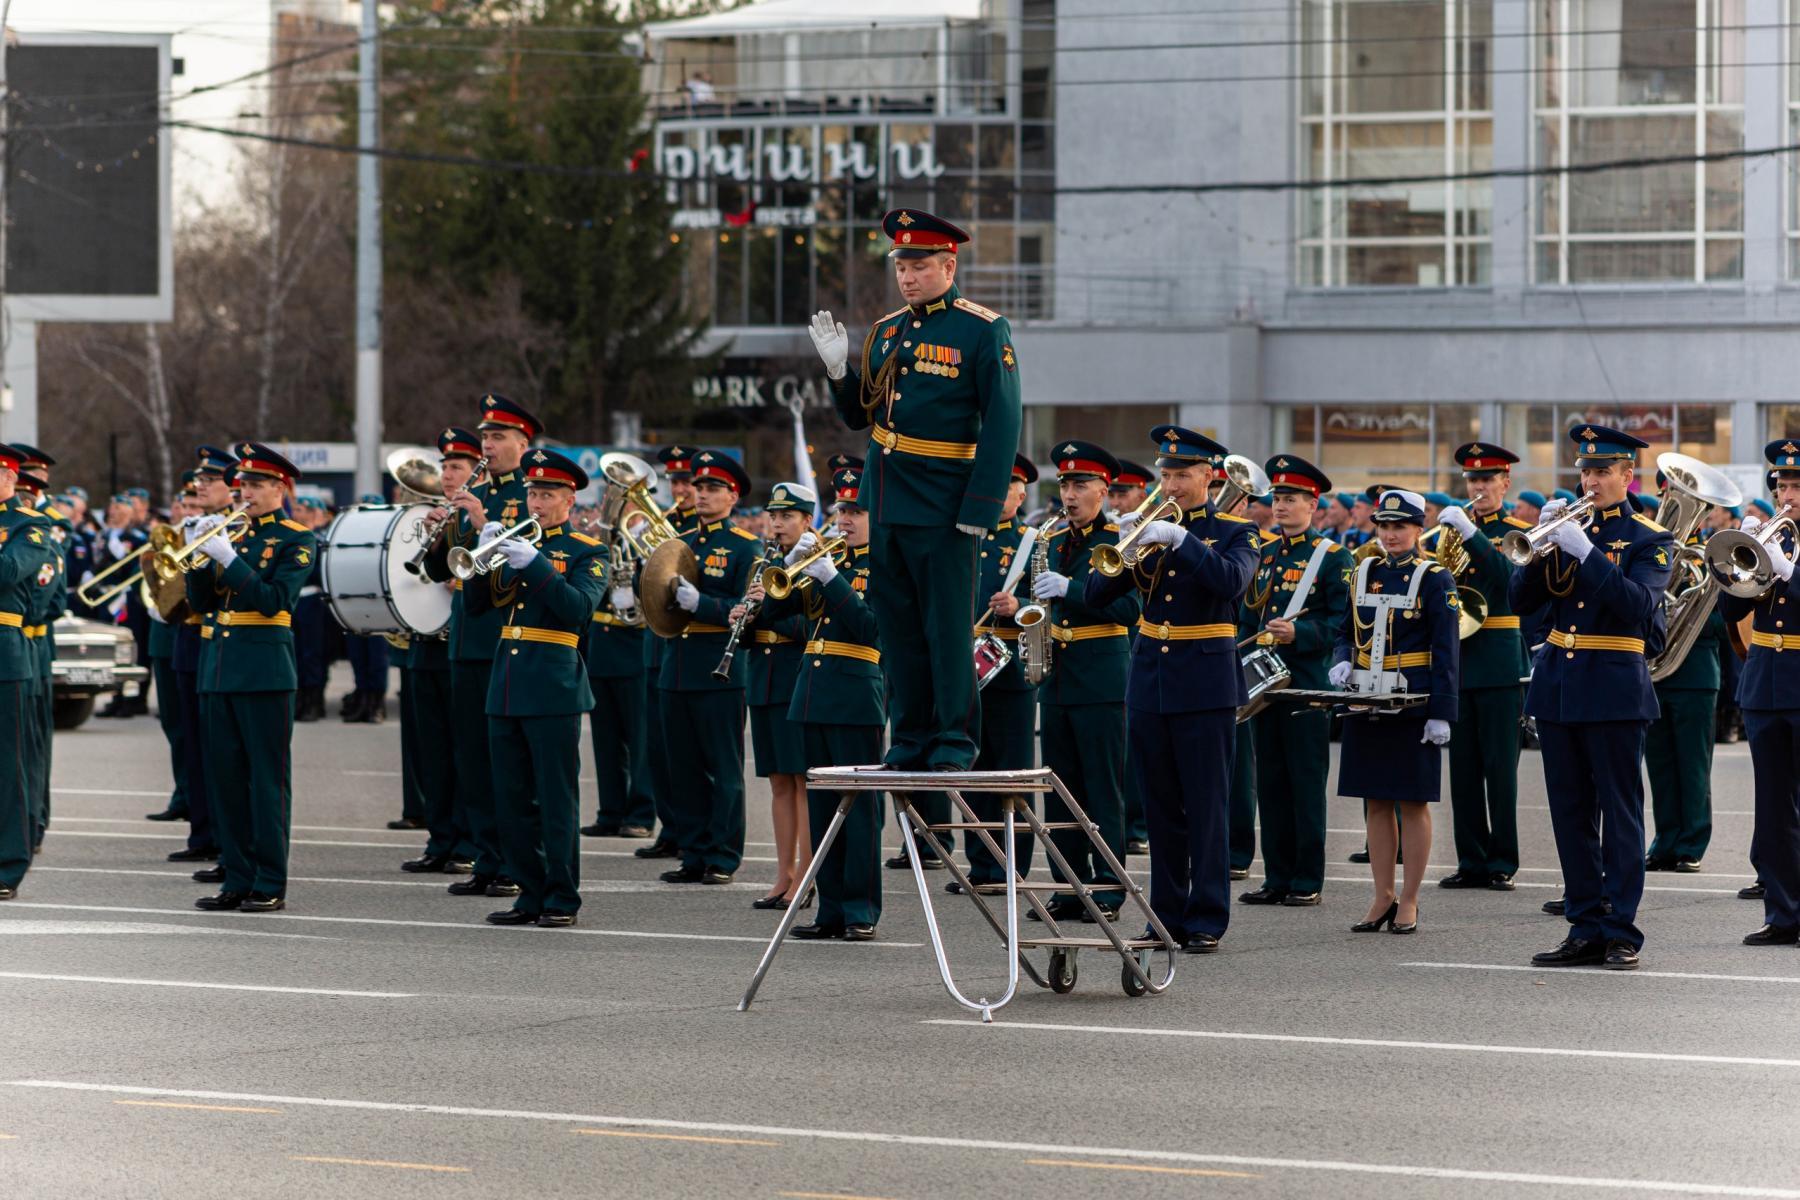 Фото Флаги, форма, техника, толпы зрителей: лучшие фото с репетиции парада в Новосибирске 8